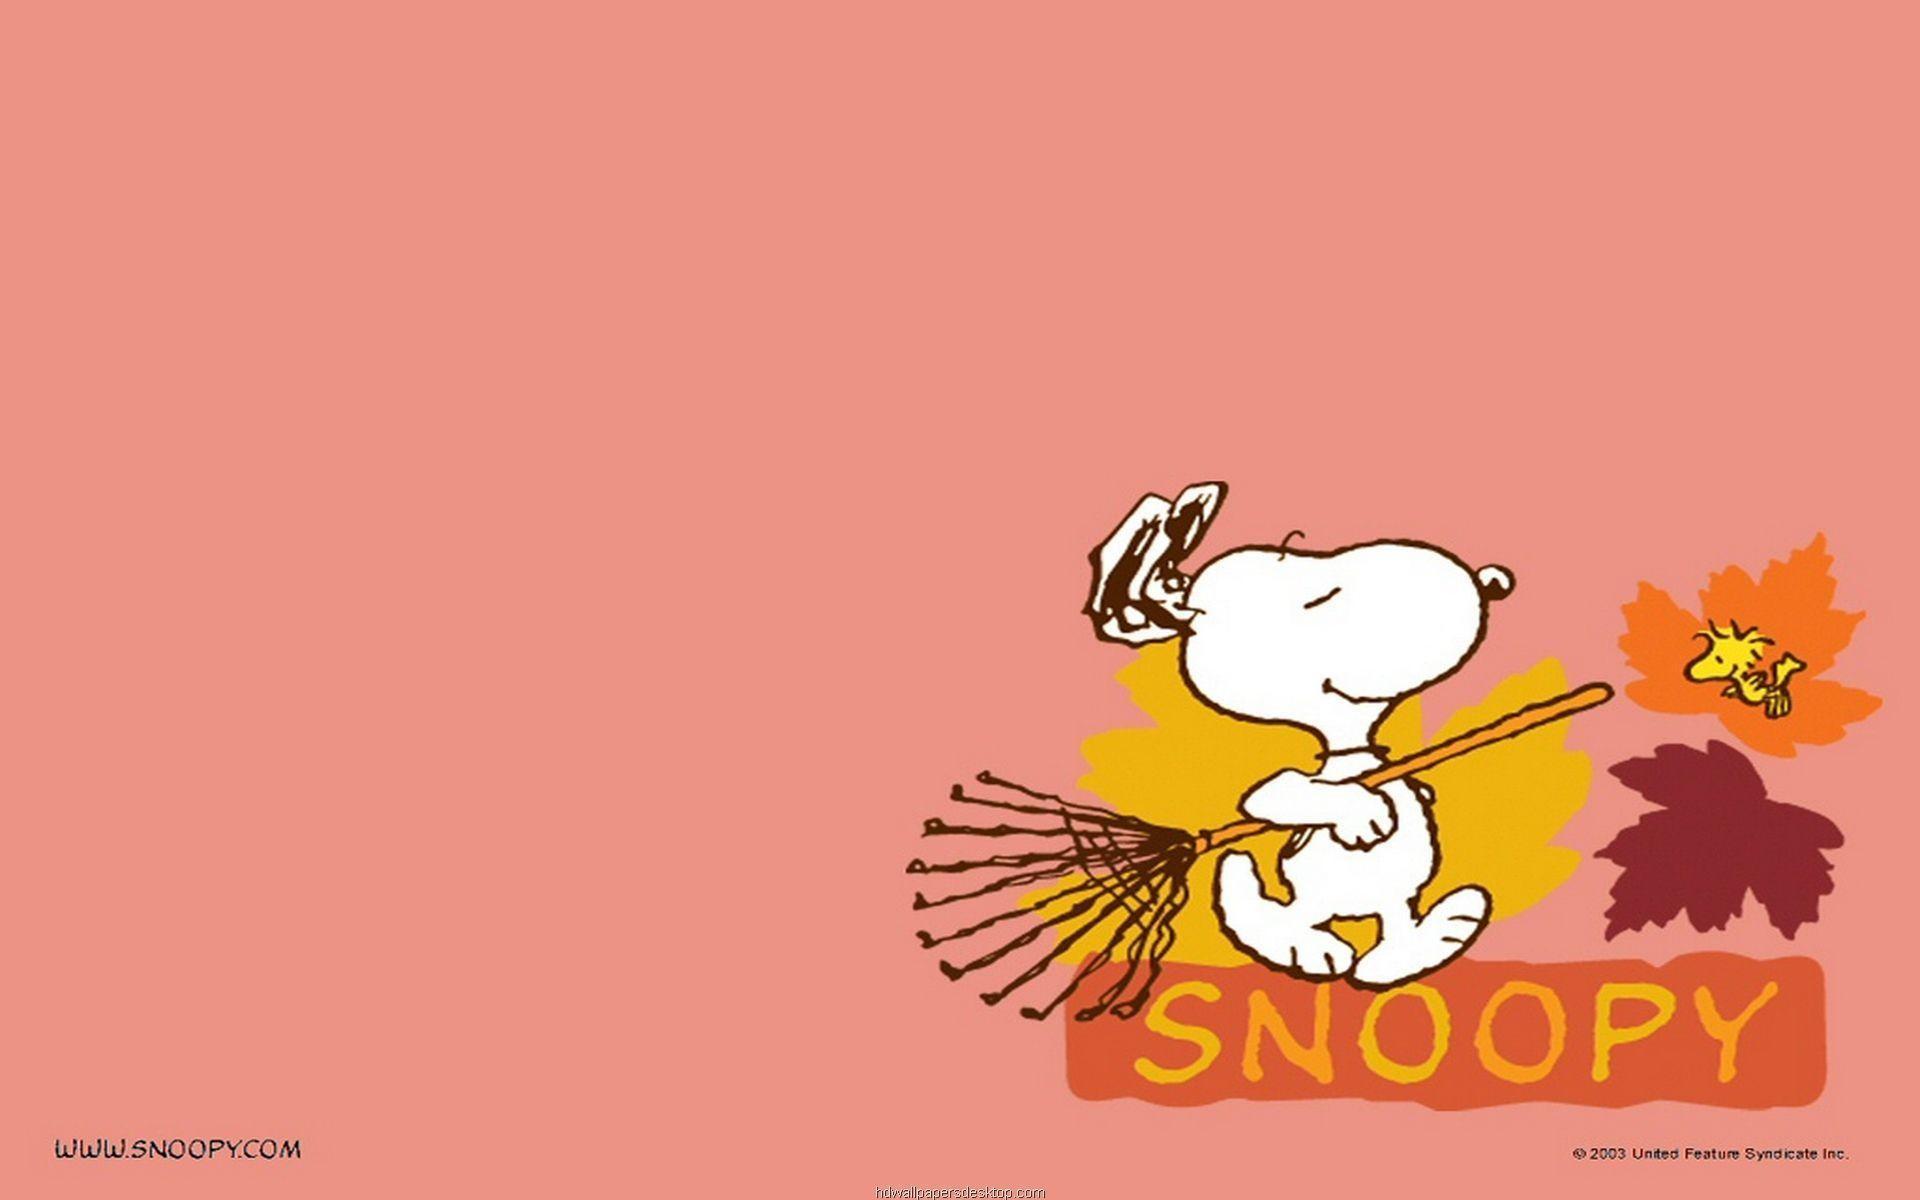 Snoopy Wallpaper   Large HD Wallpaper Database